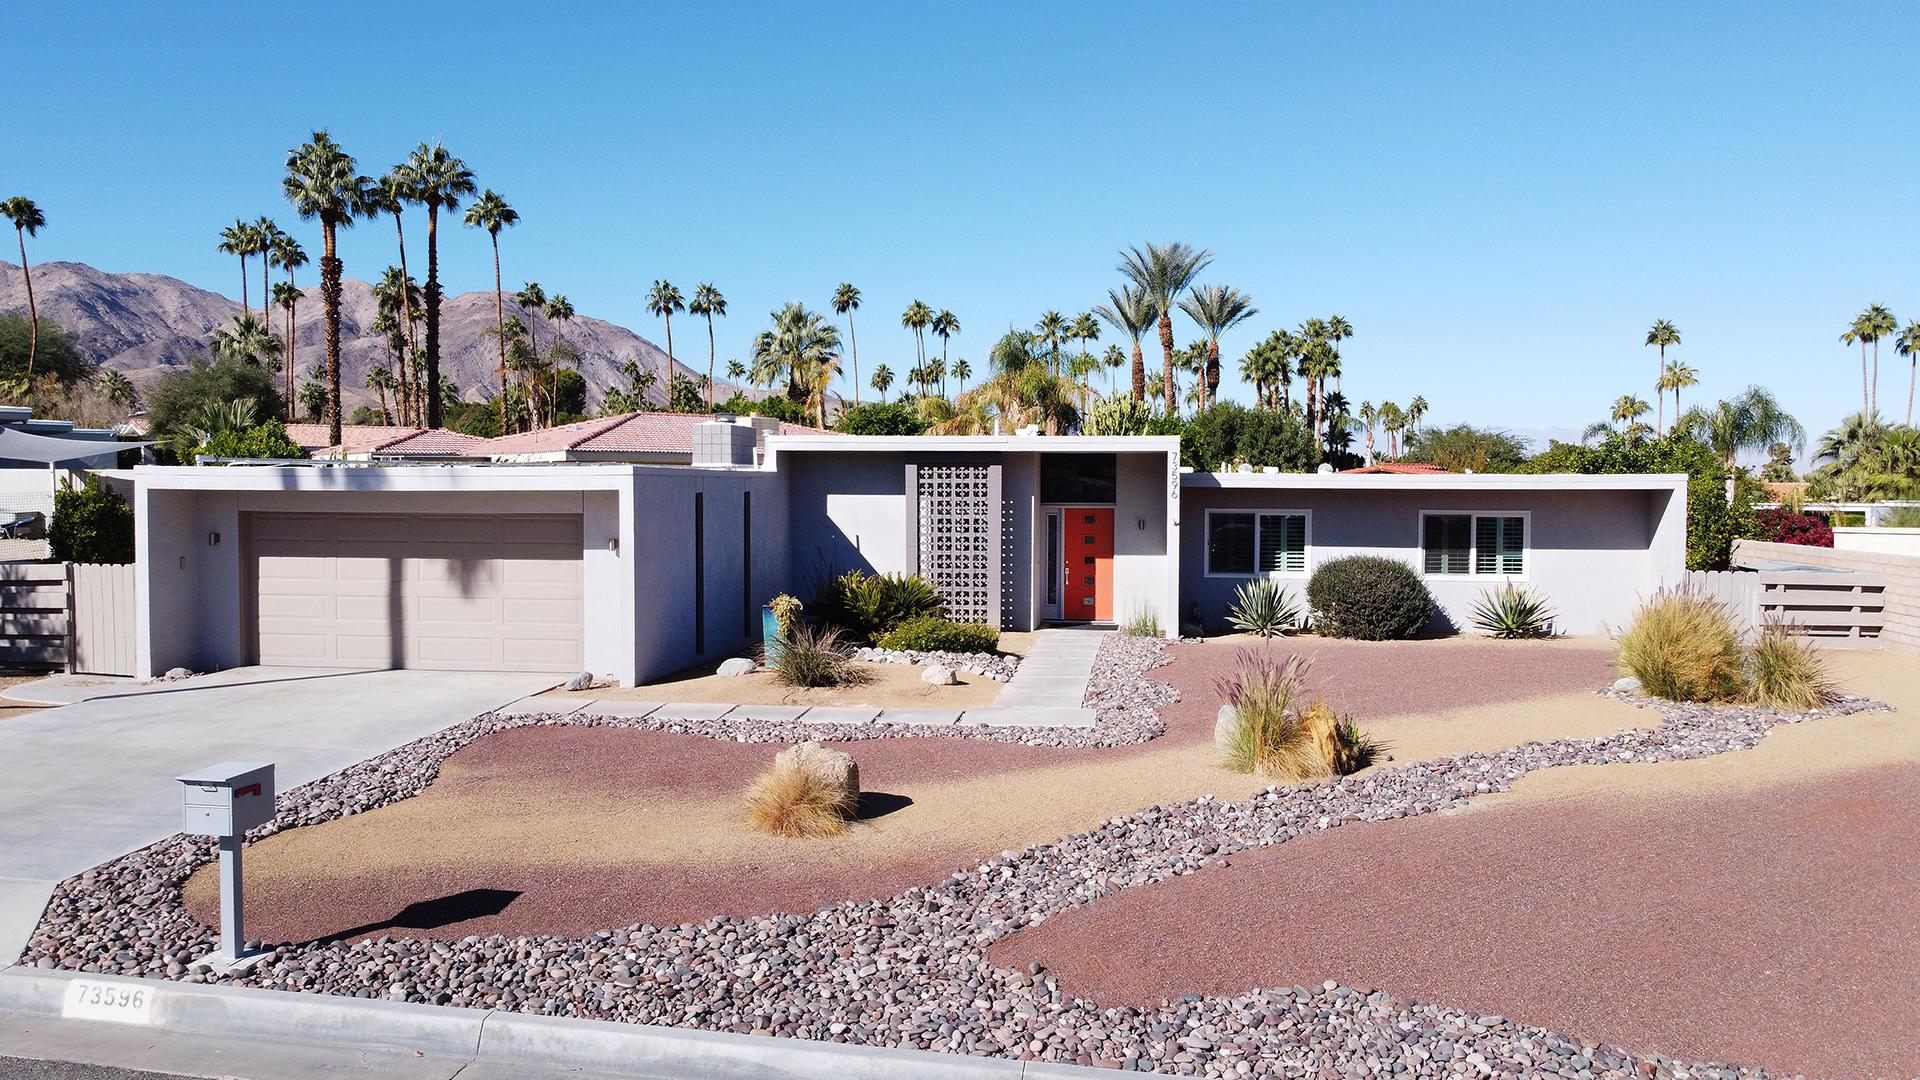 Photo of 73596 Sun Lane, Palm Desert, CA 92260